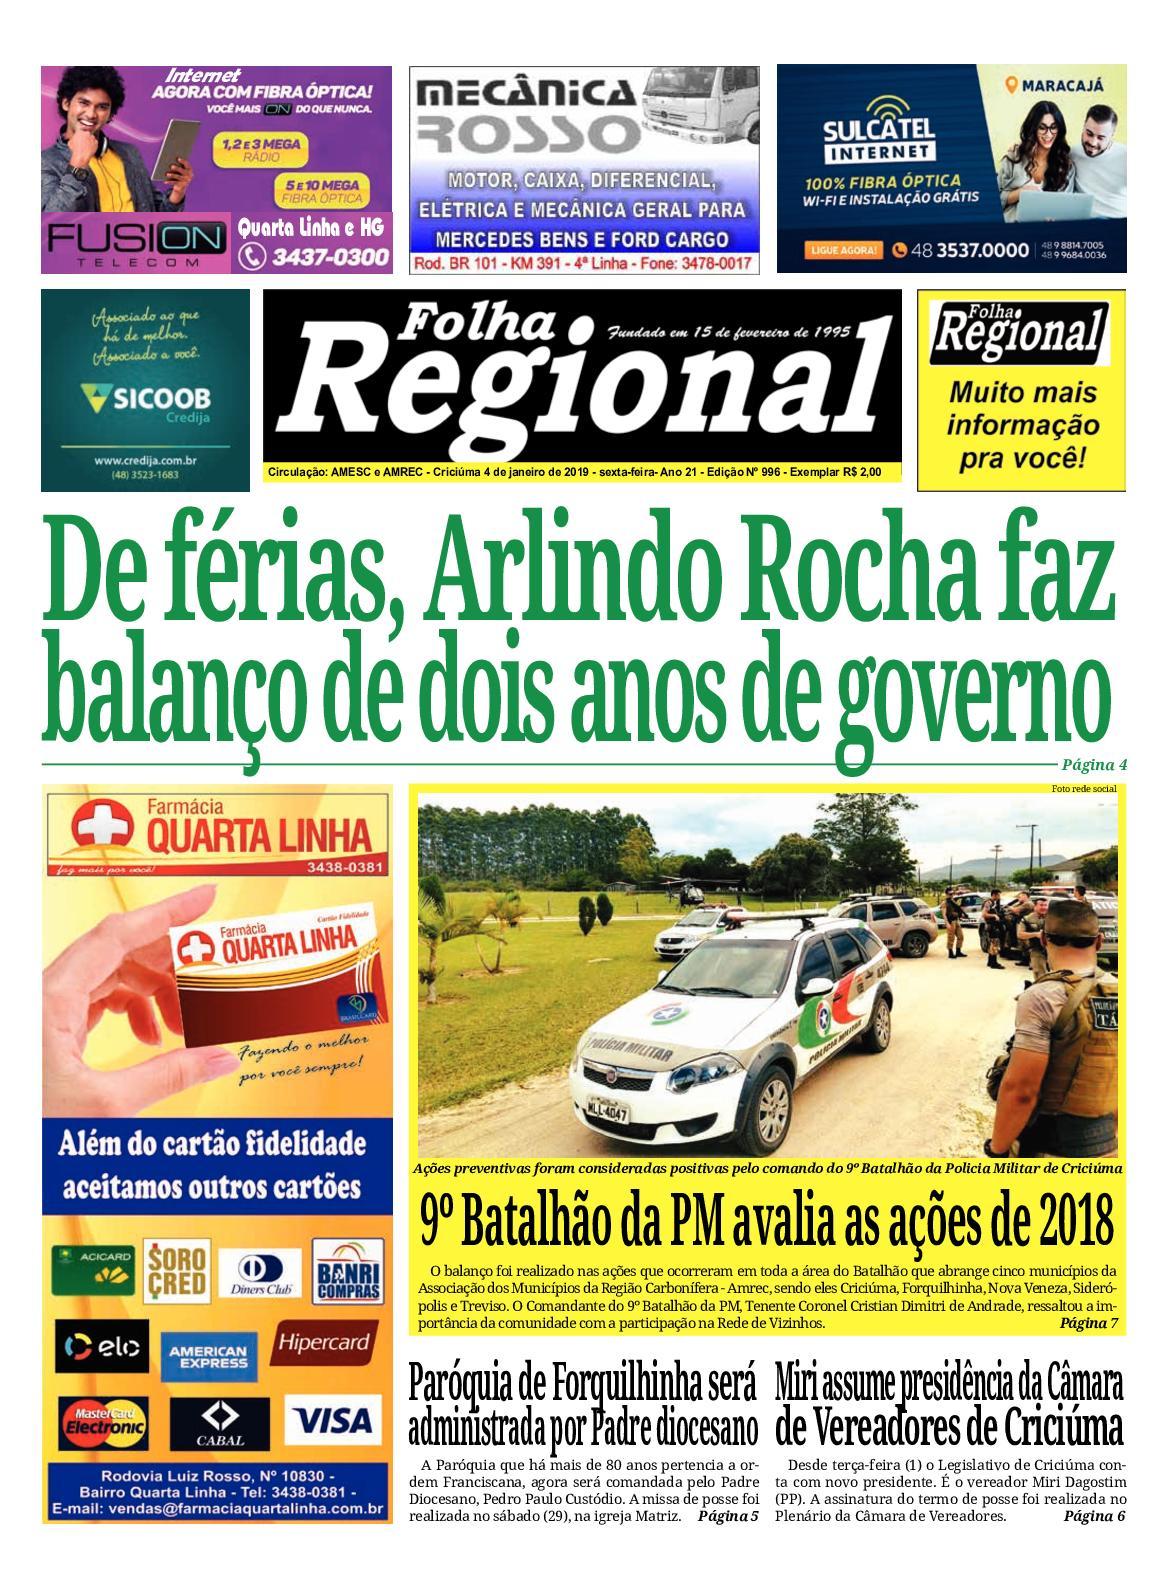 Folha Regional Ed.996 - 04 01 2019 - CALAMEO Downloader c9267fcd11